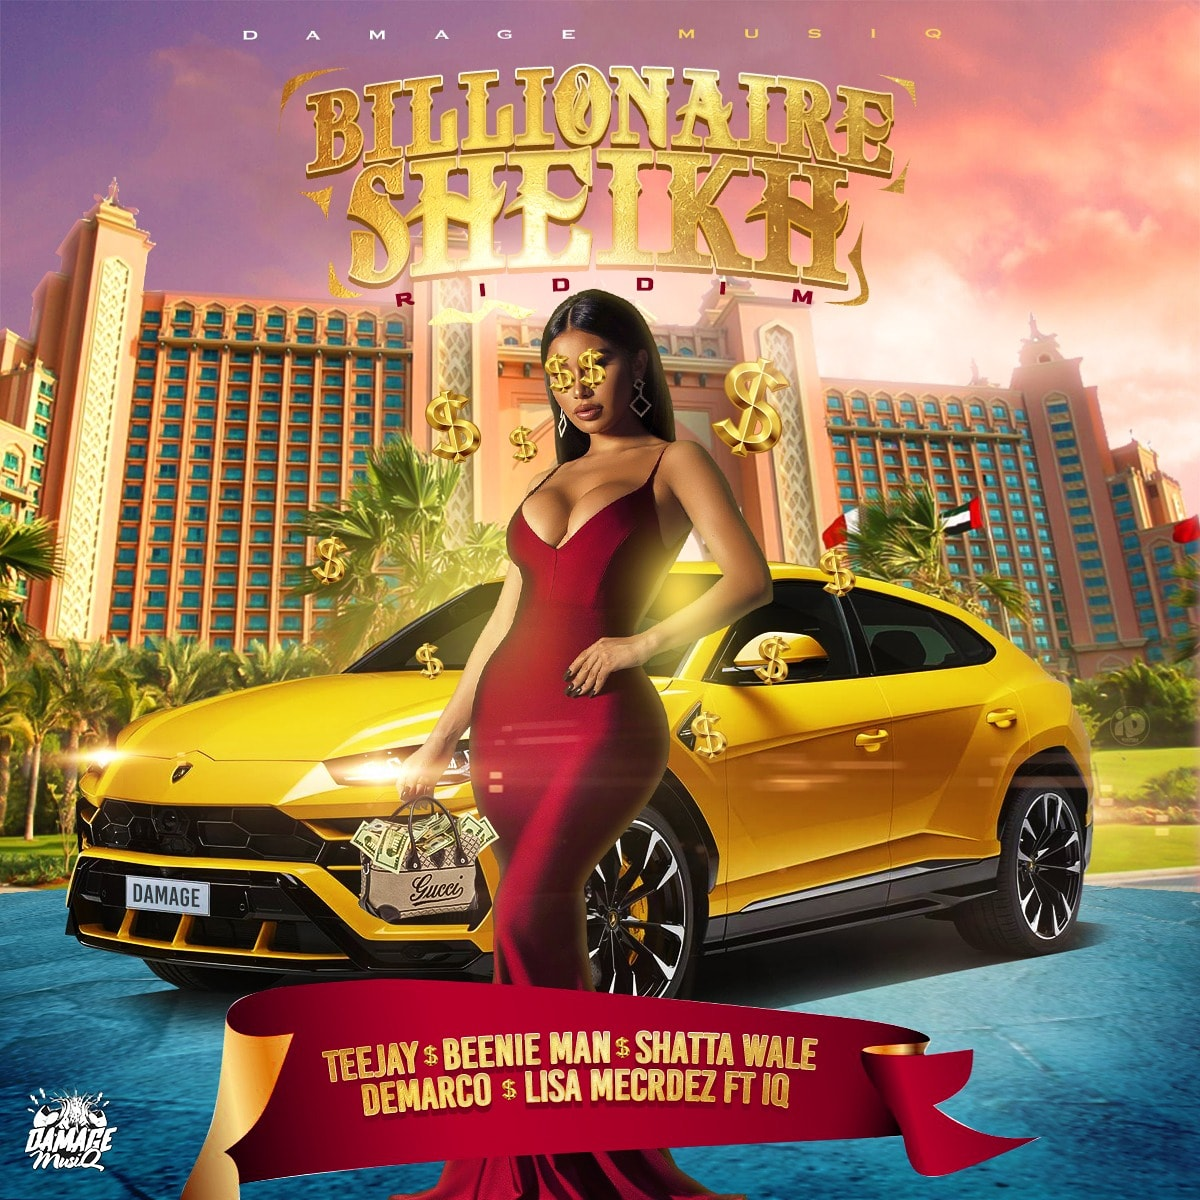 Billionaire Sheikh Riddim - EP by Various Artists https://music.apple.com/us/album/billionaire-sheikh-riddim-ep/1523248632… @DamageMusiqpic.twitter.com/CSWS3oYqNb